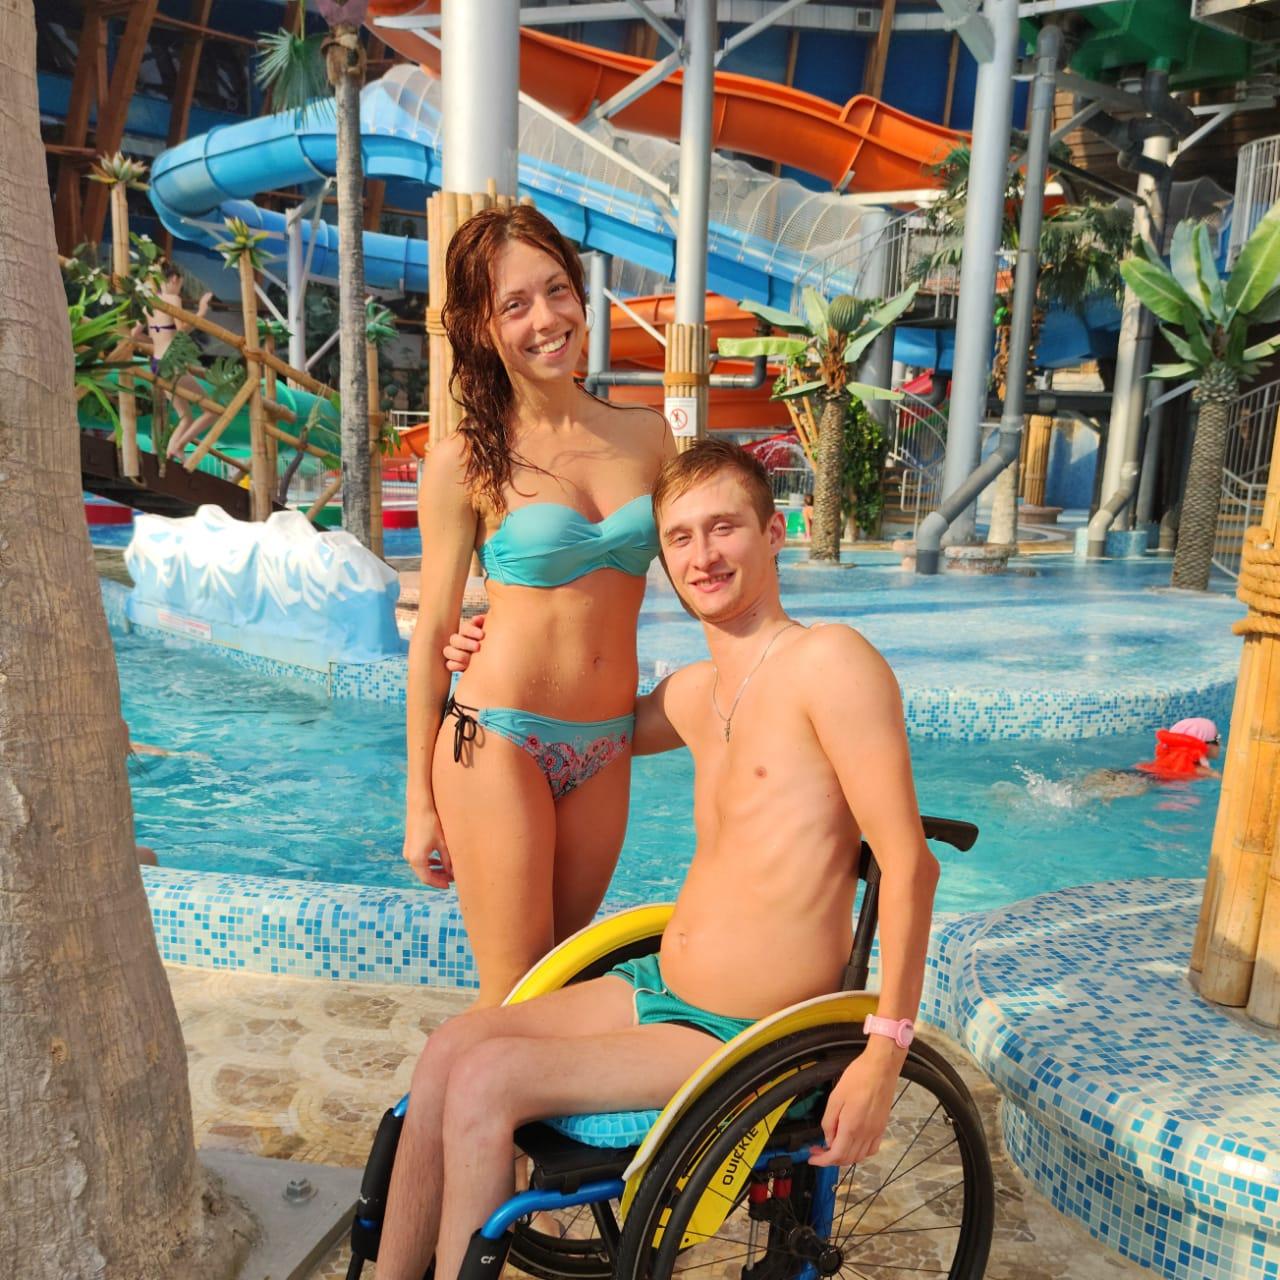 питер ленд и инвалиды